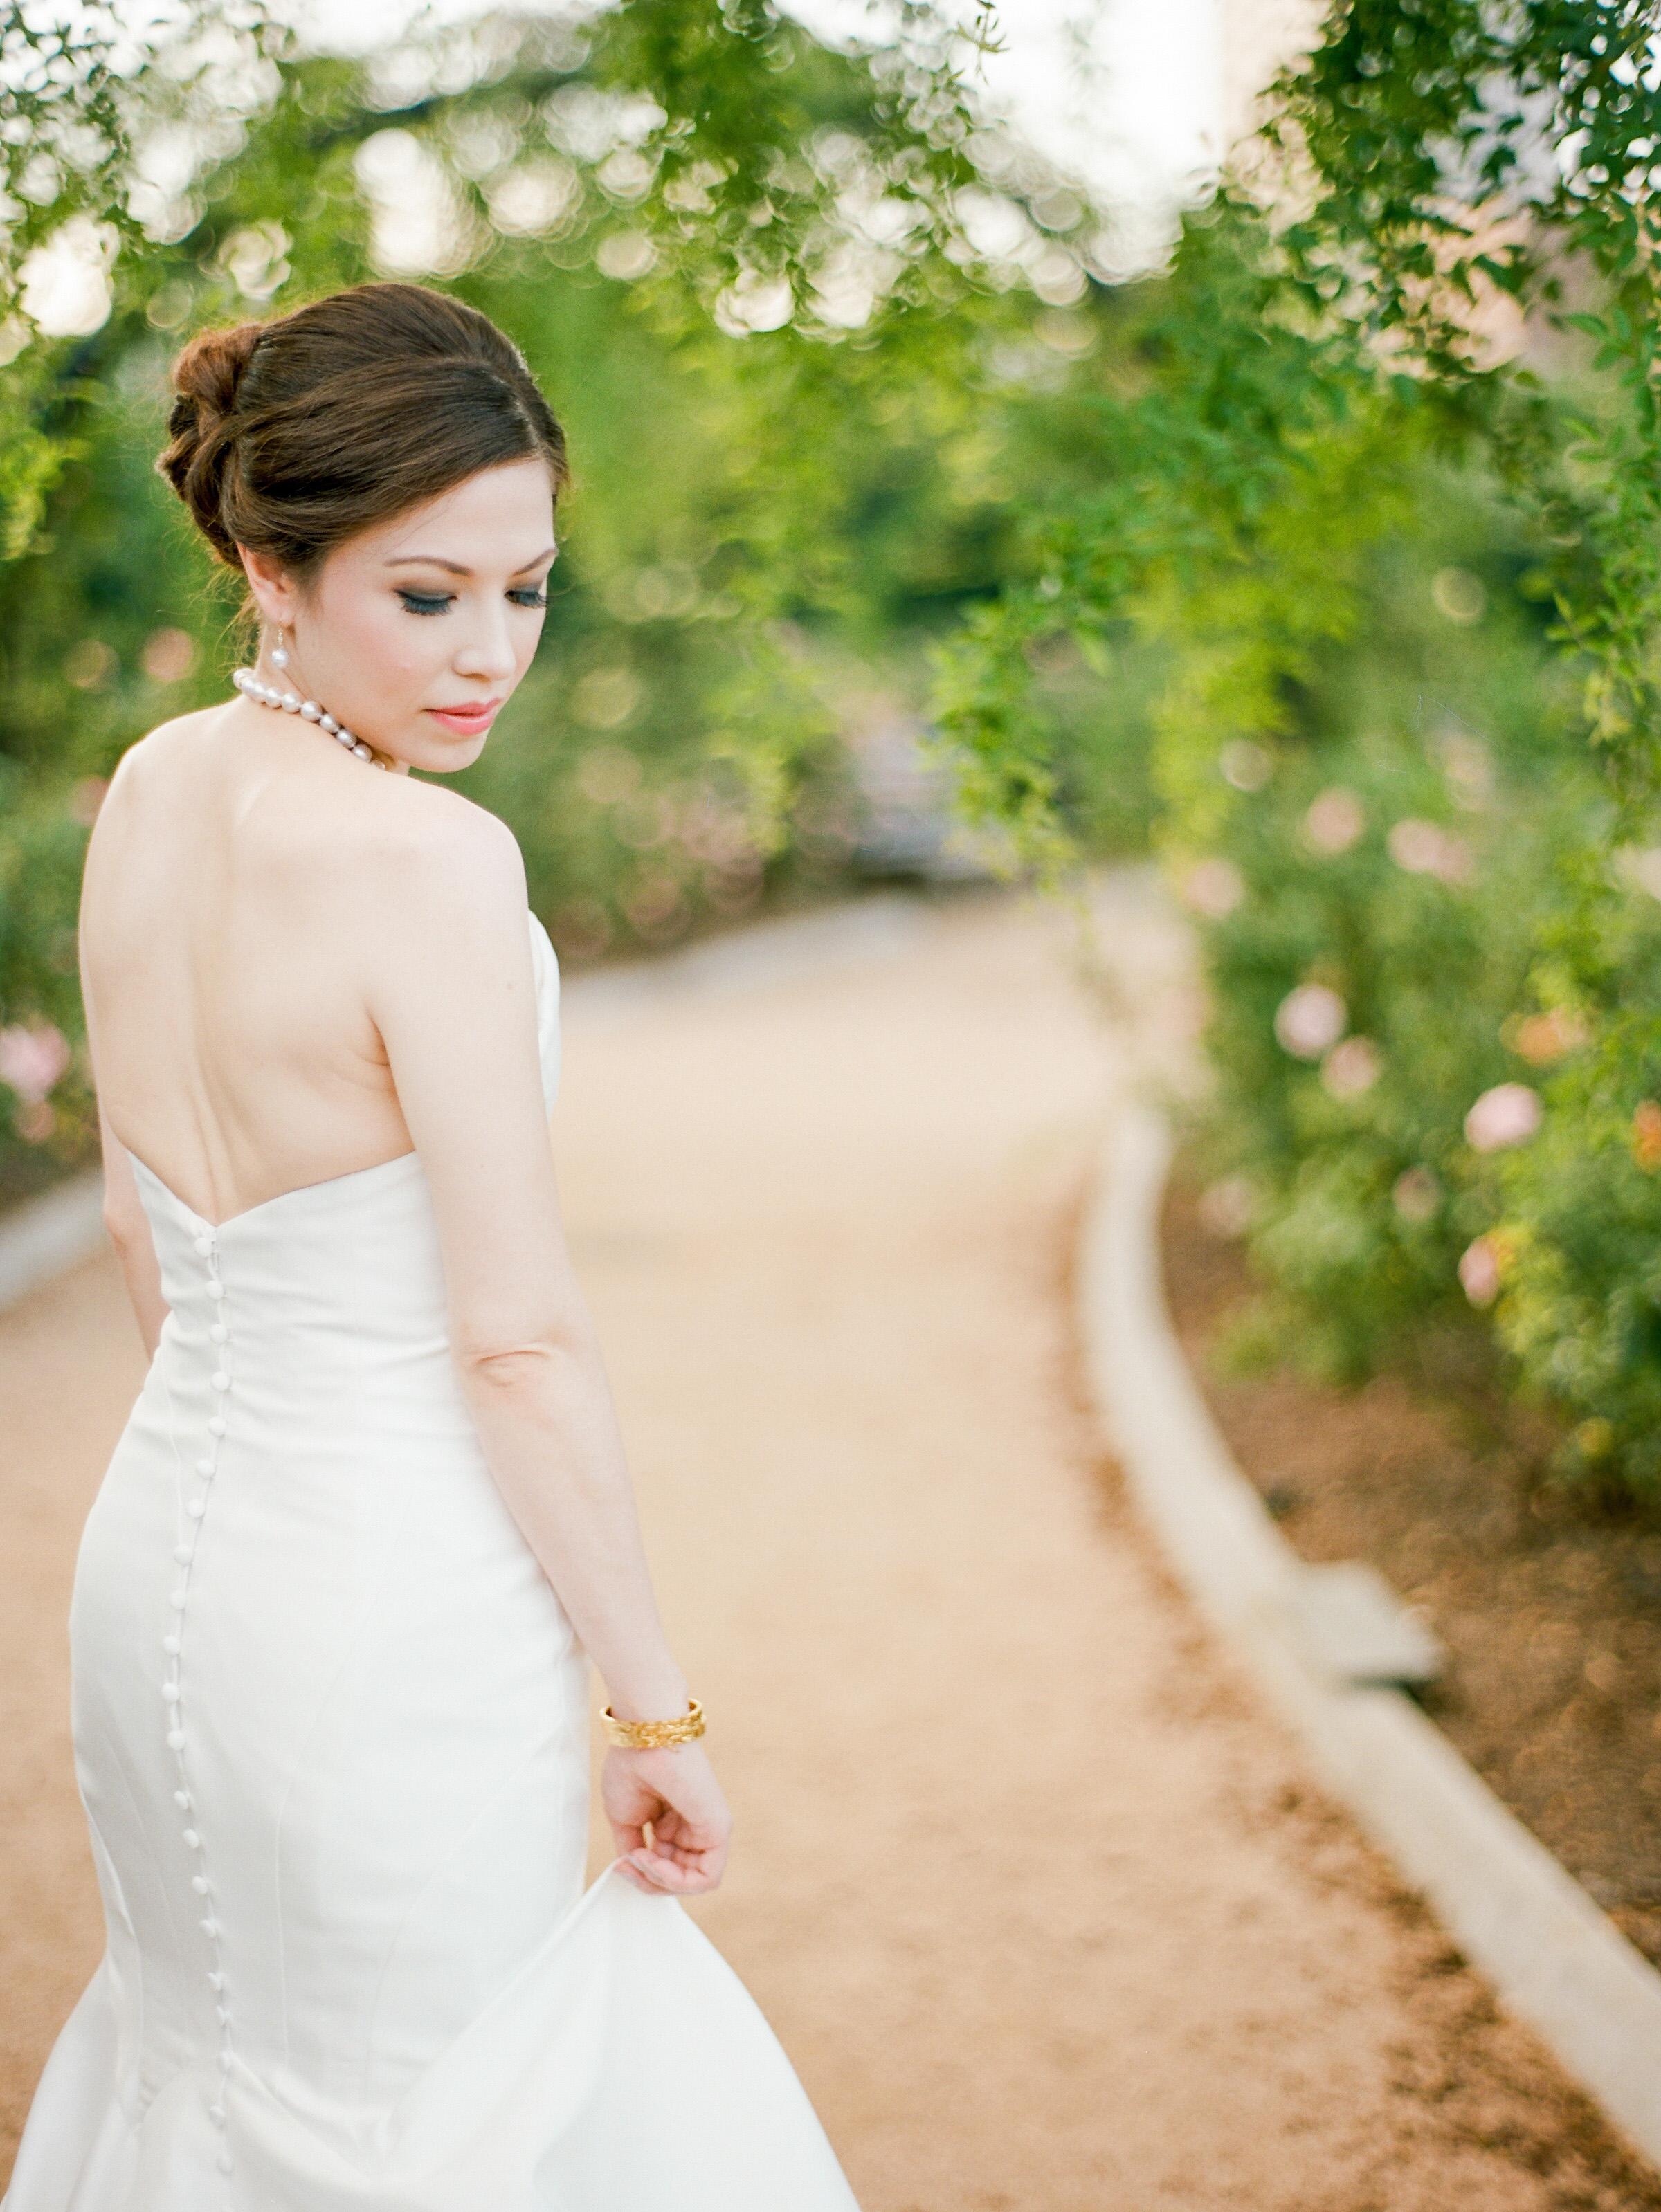 mcgovern-centennial-gardens-wedding-houston-wedding-photographer-bridals-film-austin-wedding-photographer-3.jpg